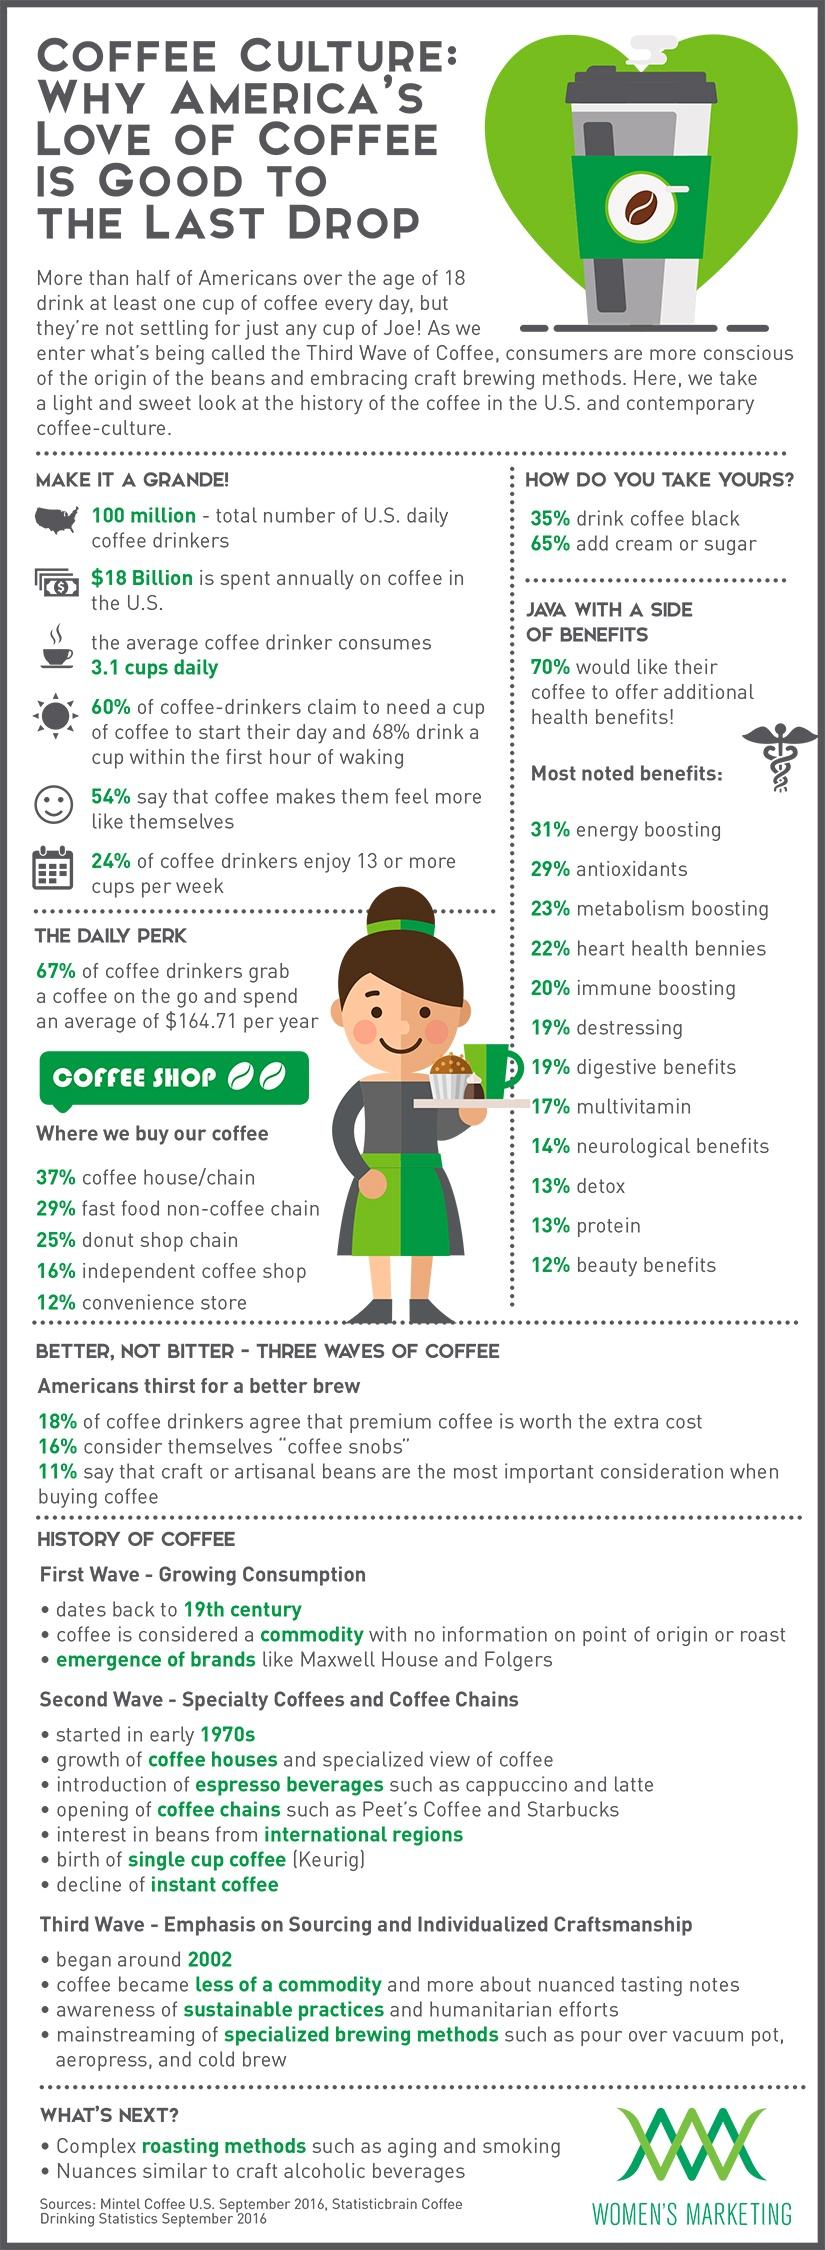 CoffeeCulture_Infographic.jpg